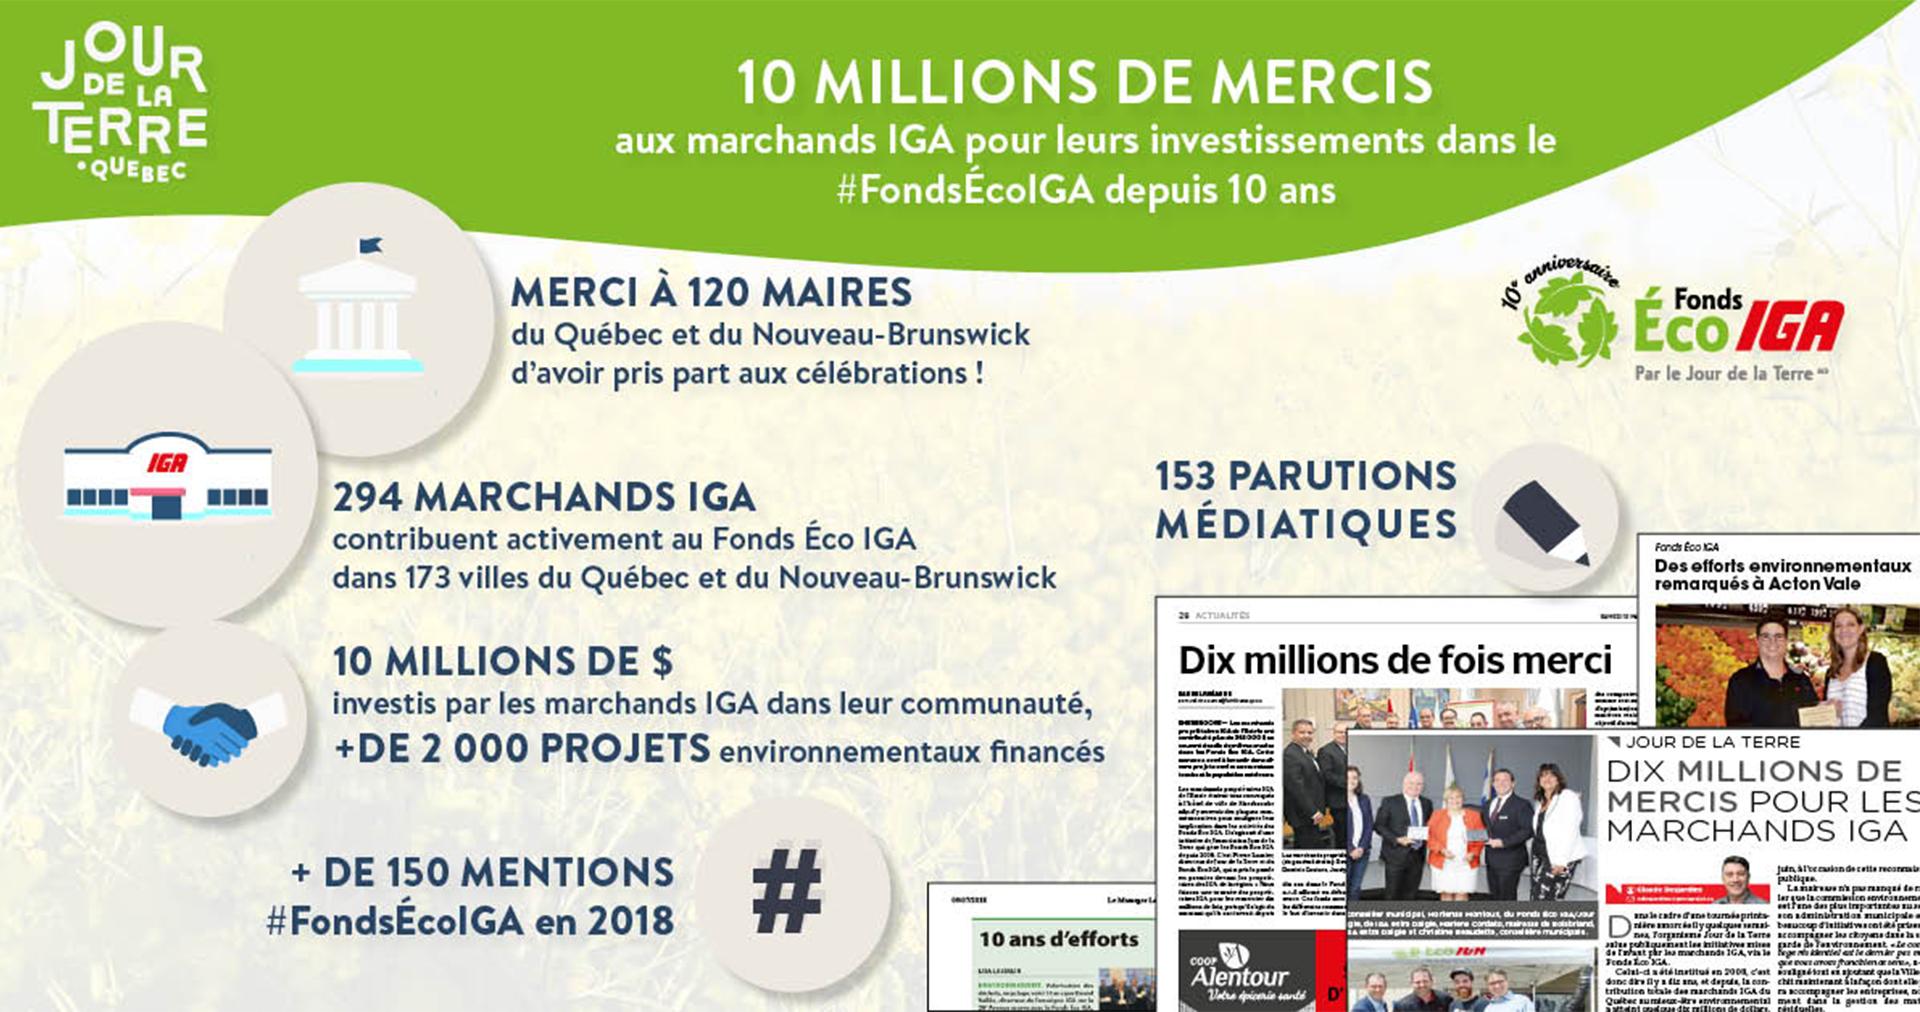 Jour_de_la_terre_québec_10_millions_de_mercis_fonds_éco_iga